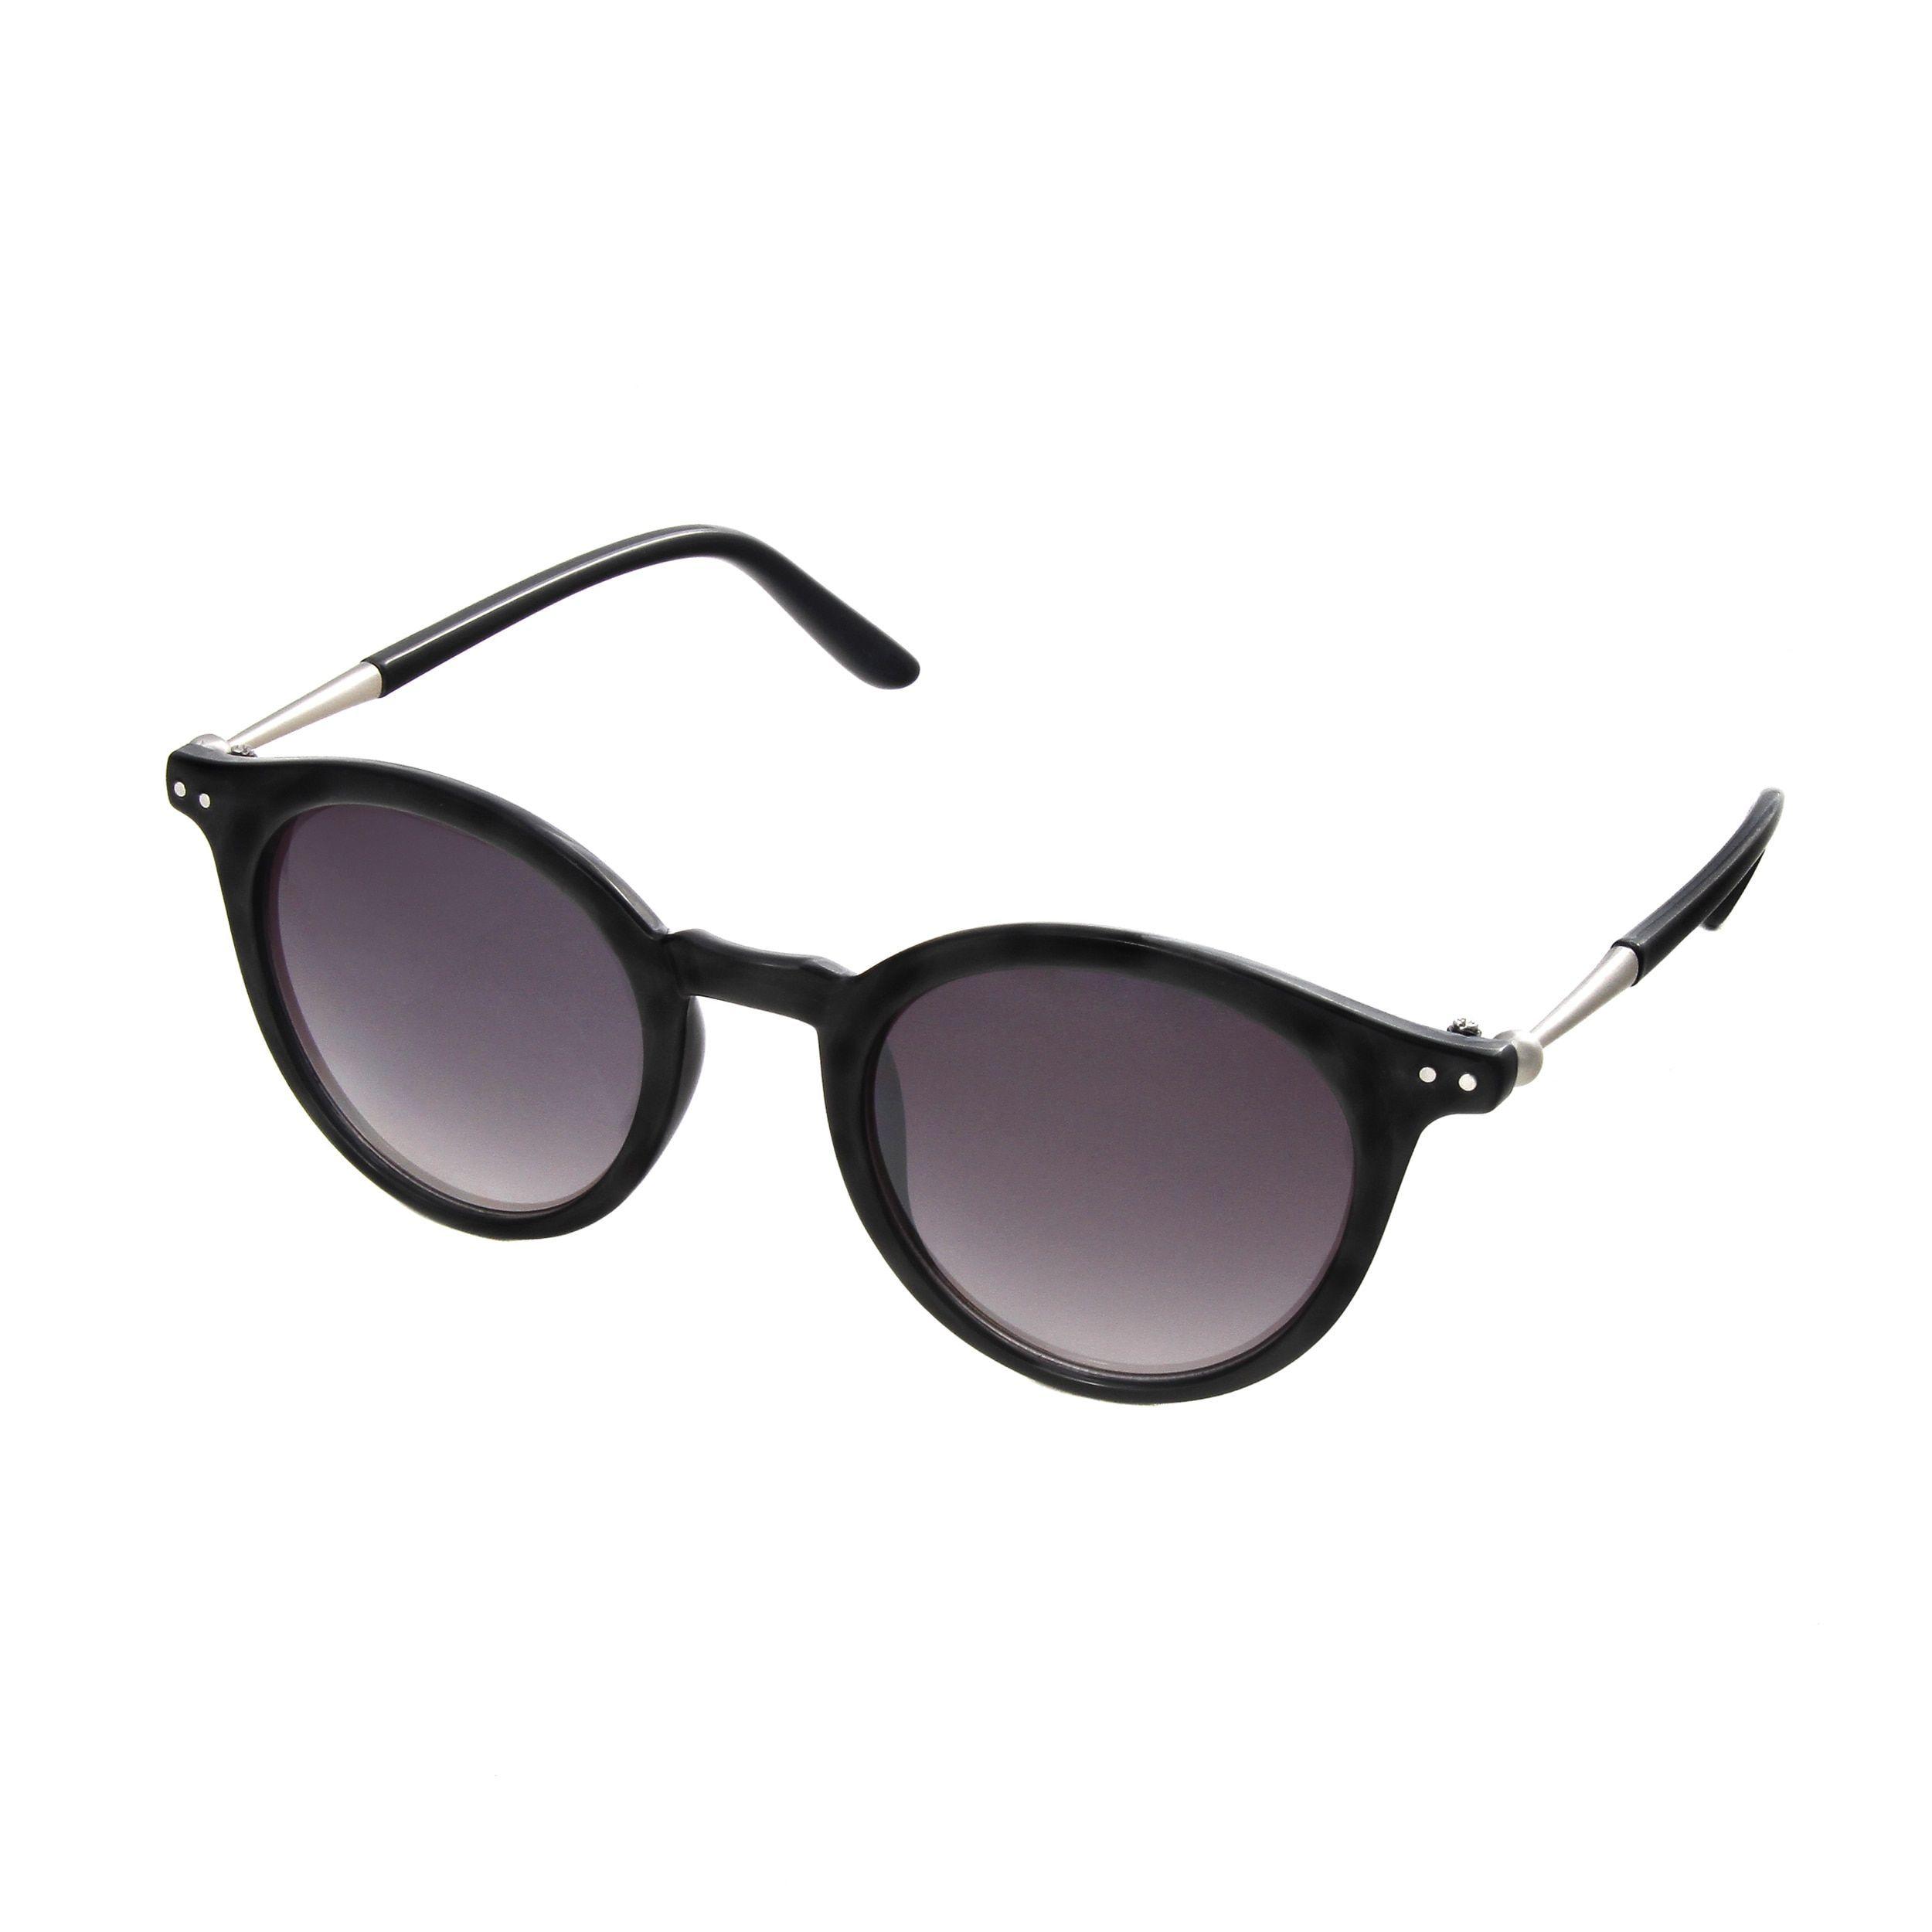 Hot Optix Women's Round Retro Embellished Temples Sunglasses